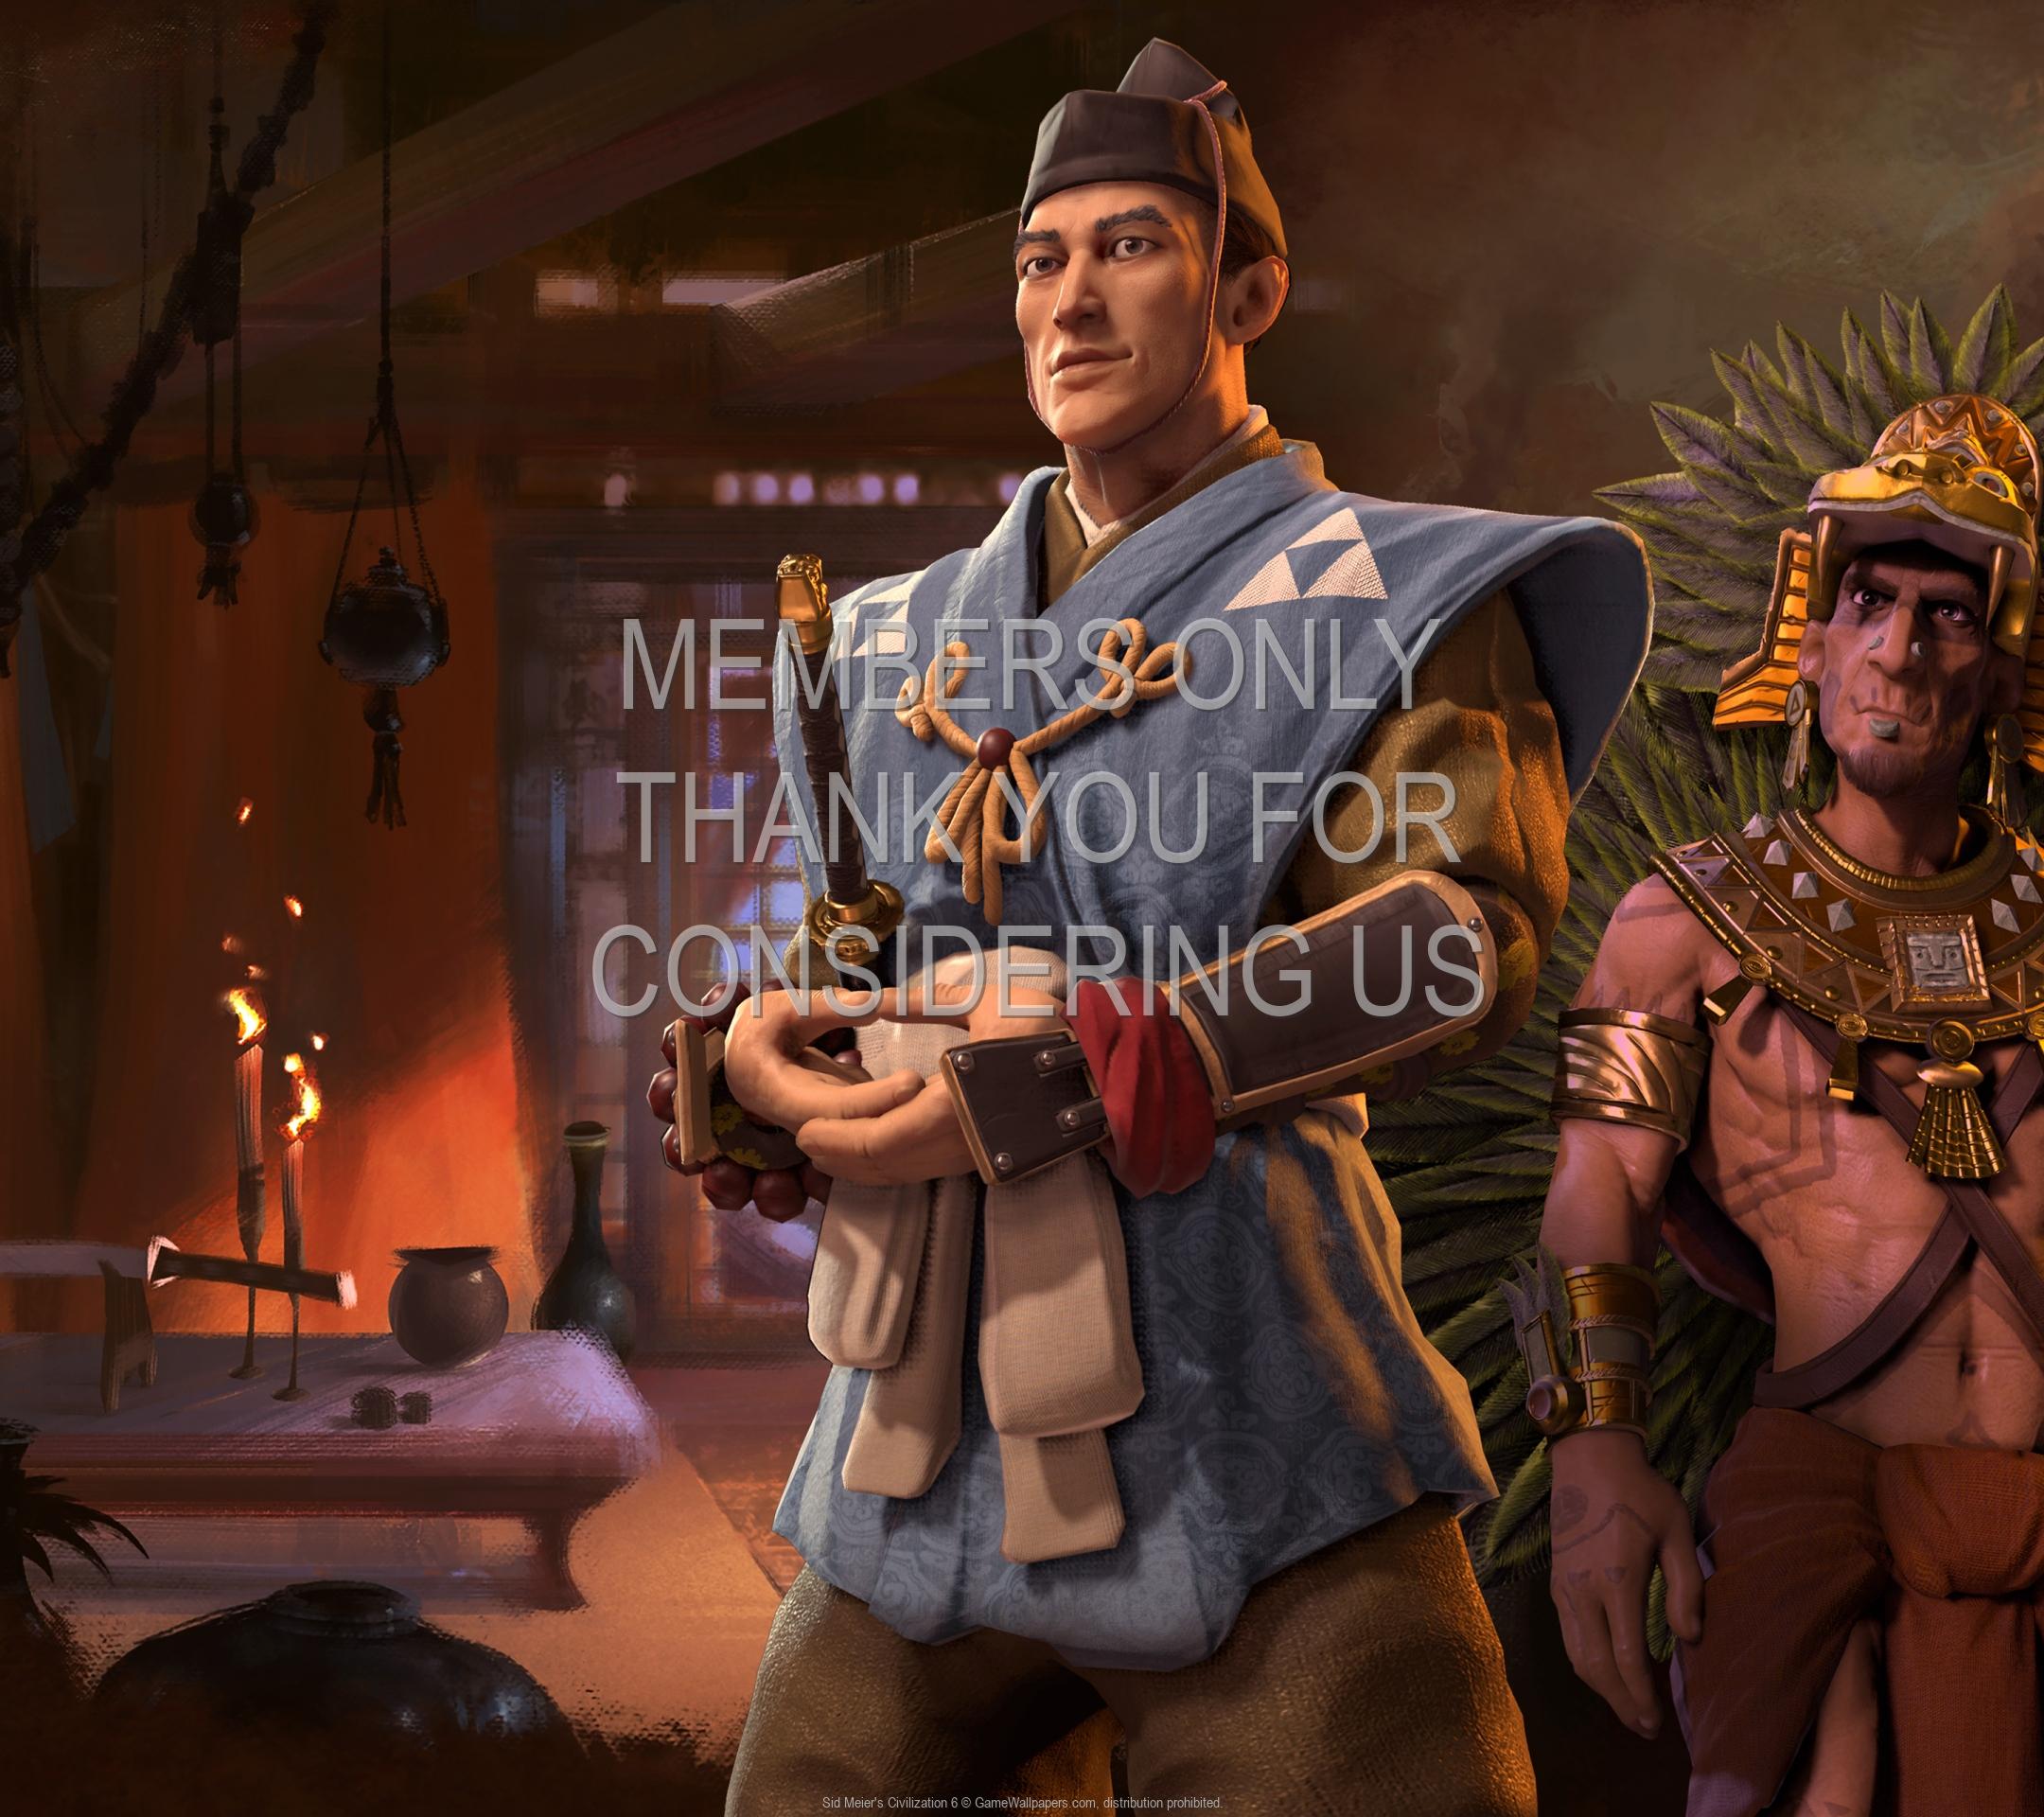 Sid Meier's Civilization 6 1920x1080 Mobile wallpaper or background 04